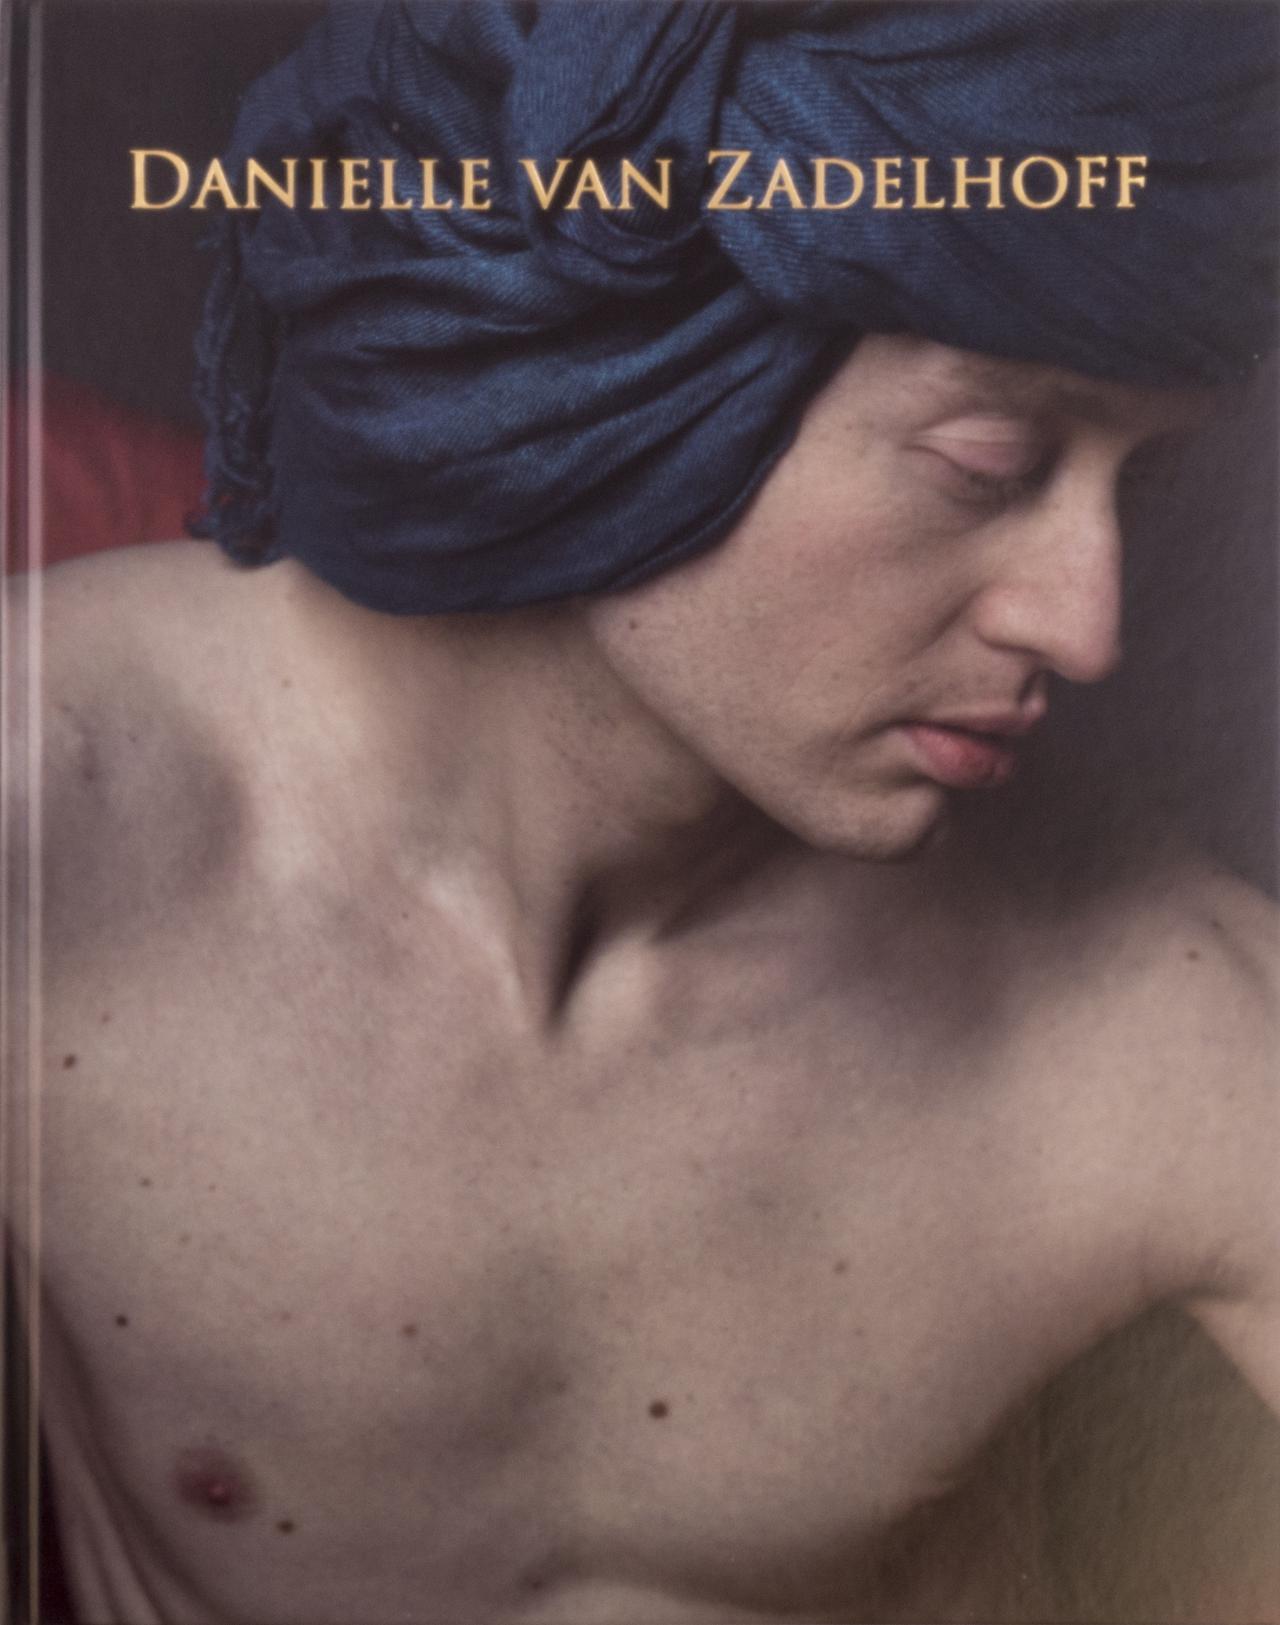 Danielle van Zadelhoff: Monography